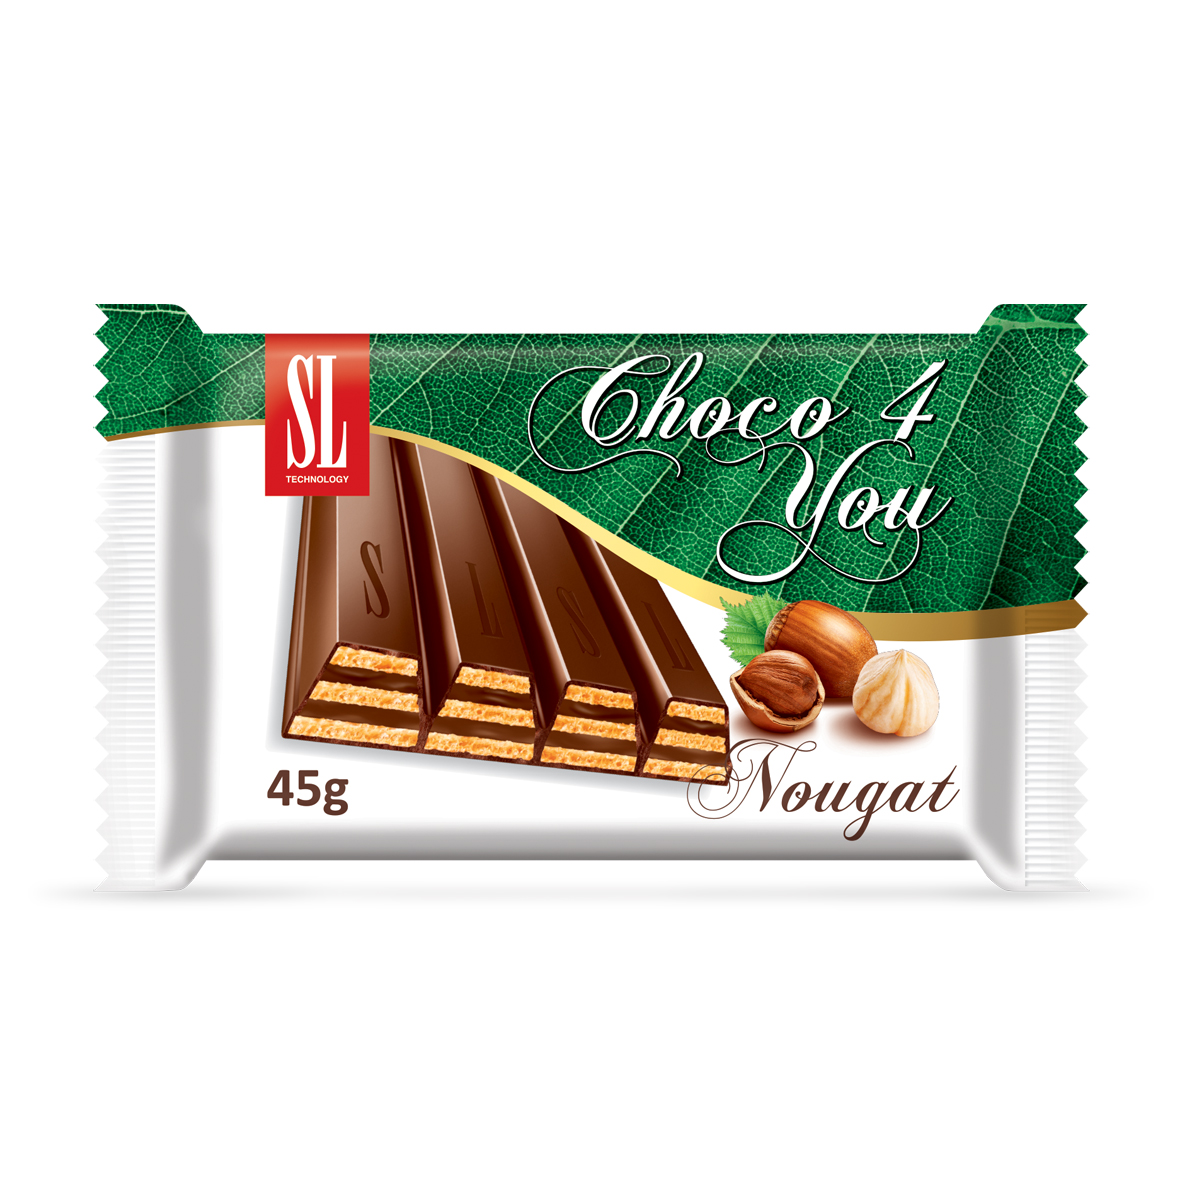 Choco 4 You nougat 45g